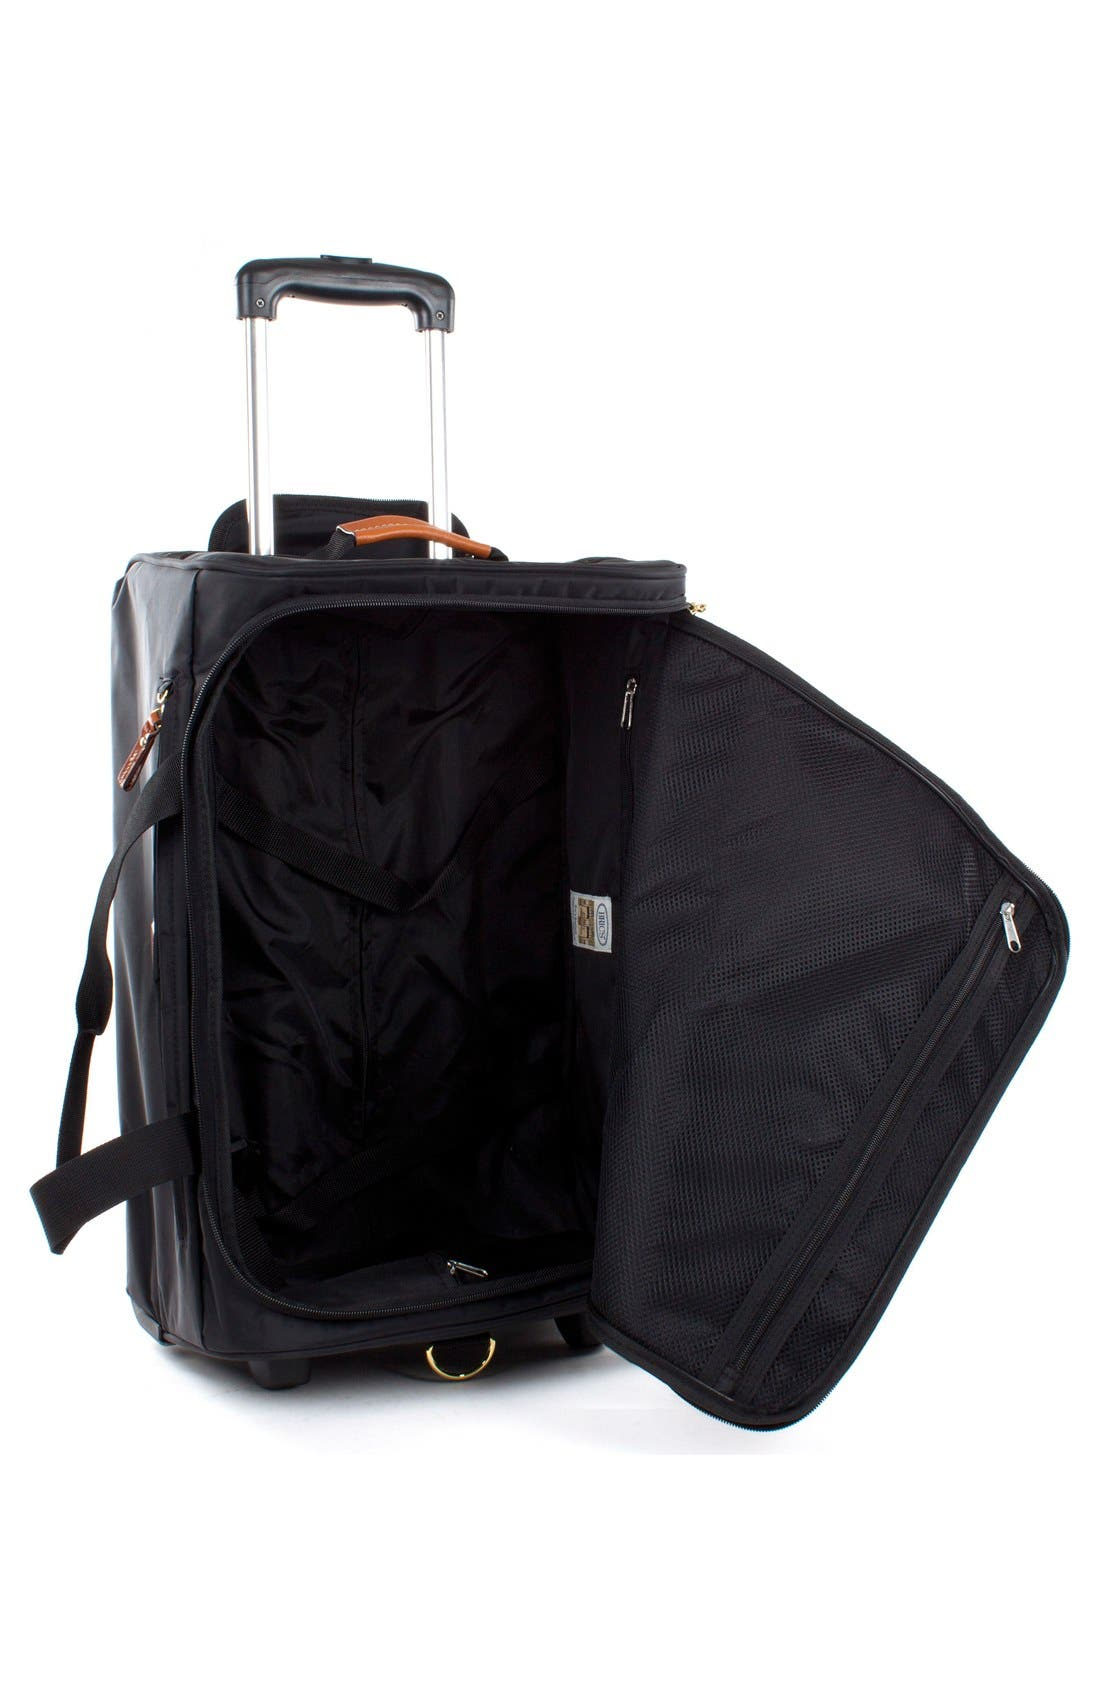 BRIC'S, Brics X-Bag 21-Inch Rolling Carry-On Duffle Bag, Alternate thumbnail 3, color, BLACK